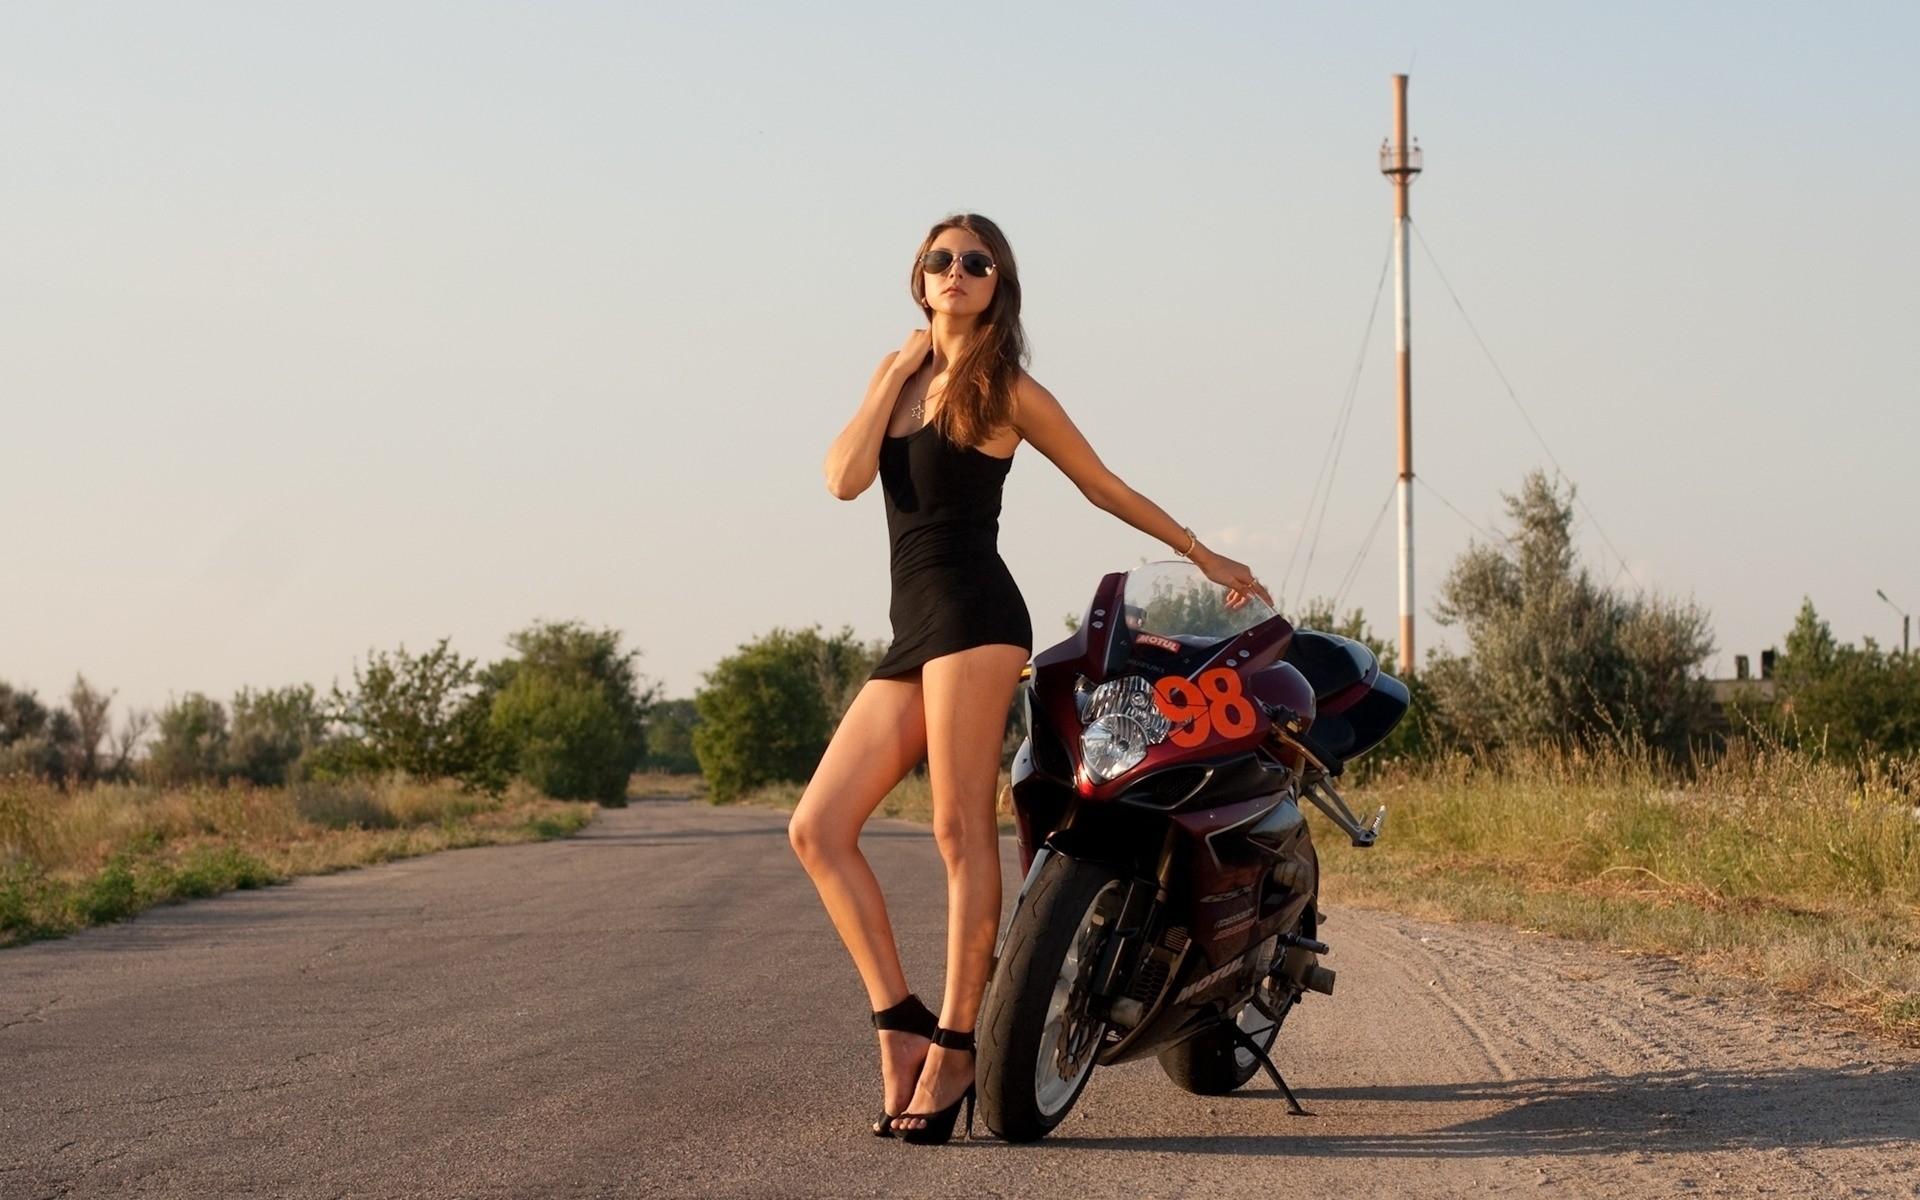 Wallpaper  Minidress, Bicycle, Tight Clothing, Legs -8806